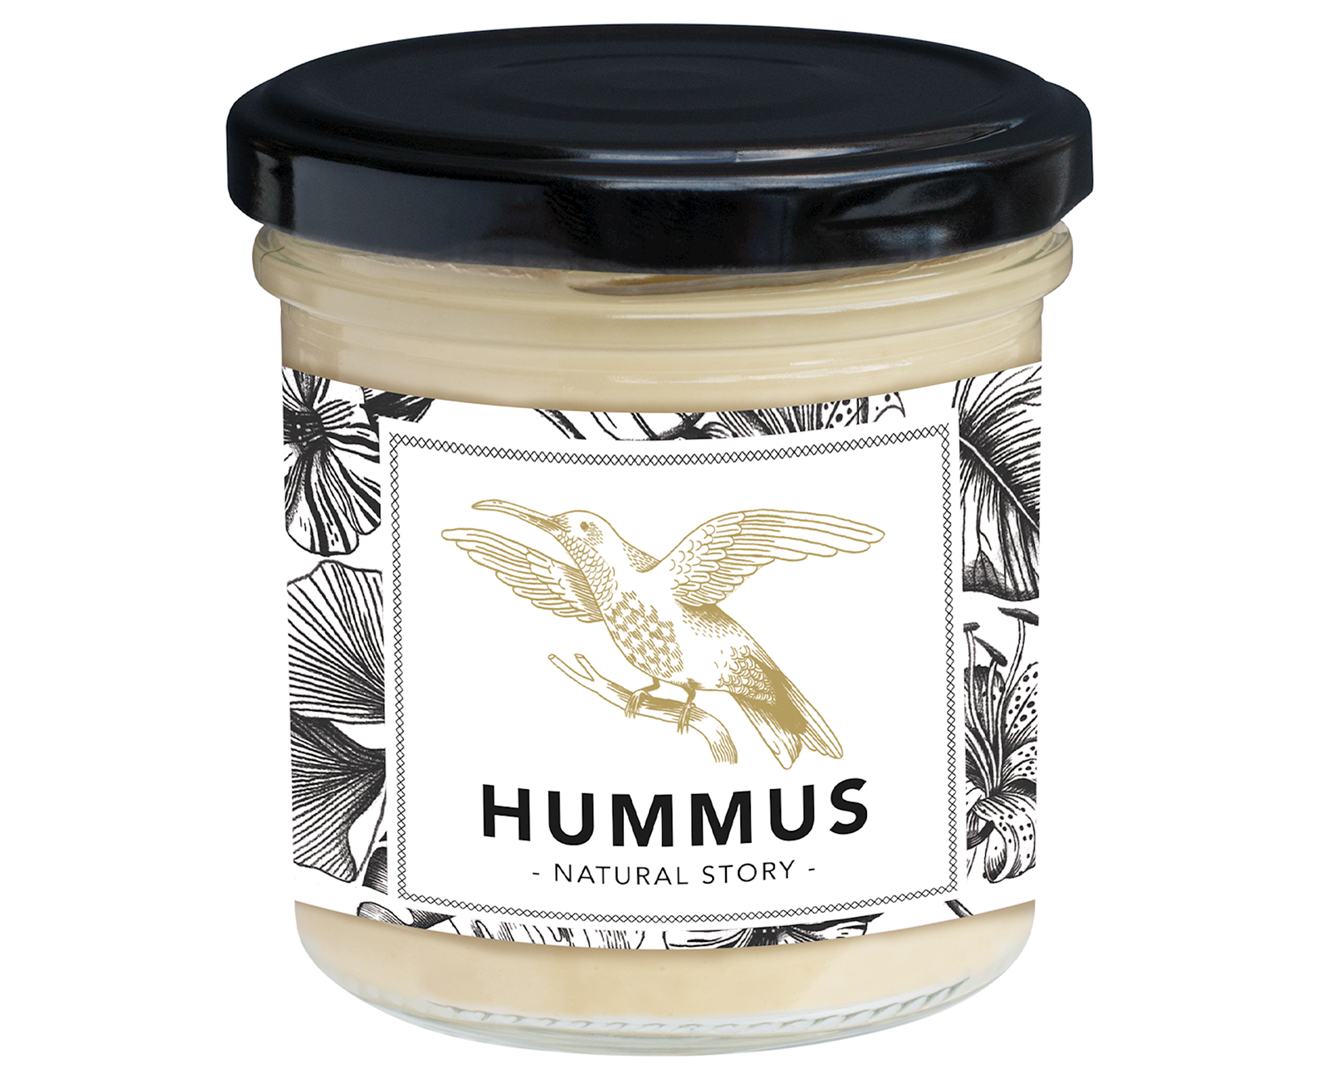 Productafbeelding Hummus Natural story 130g pot